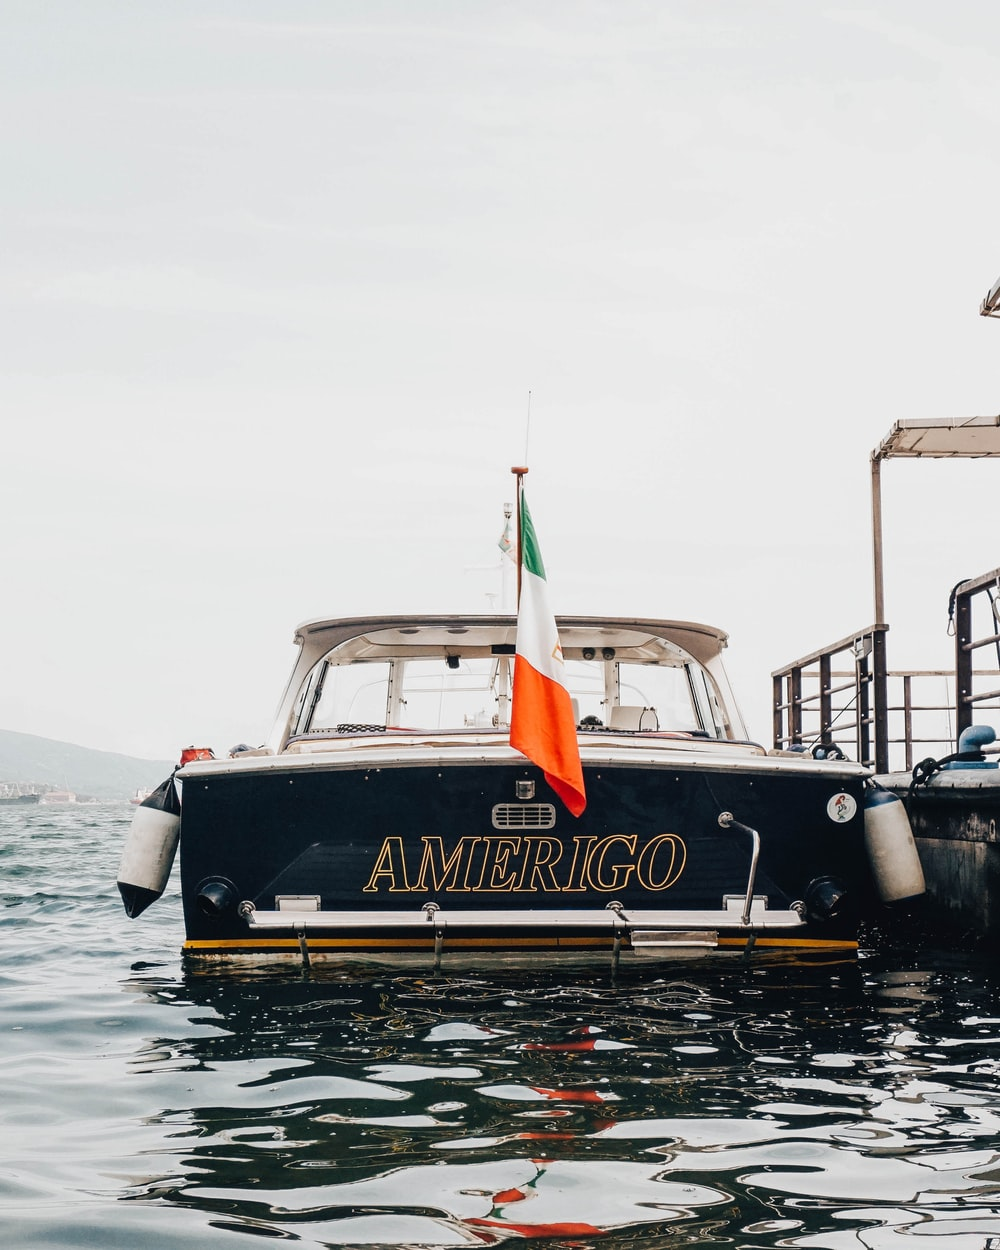 black and white Amerigo boat beside gray concrete dock during daytime